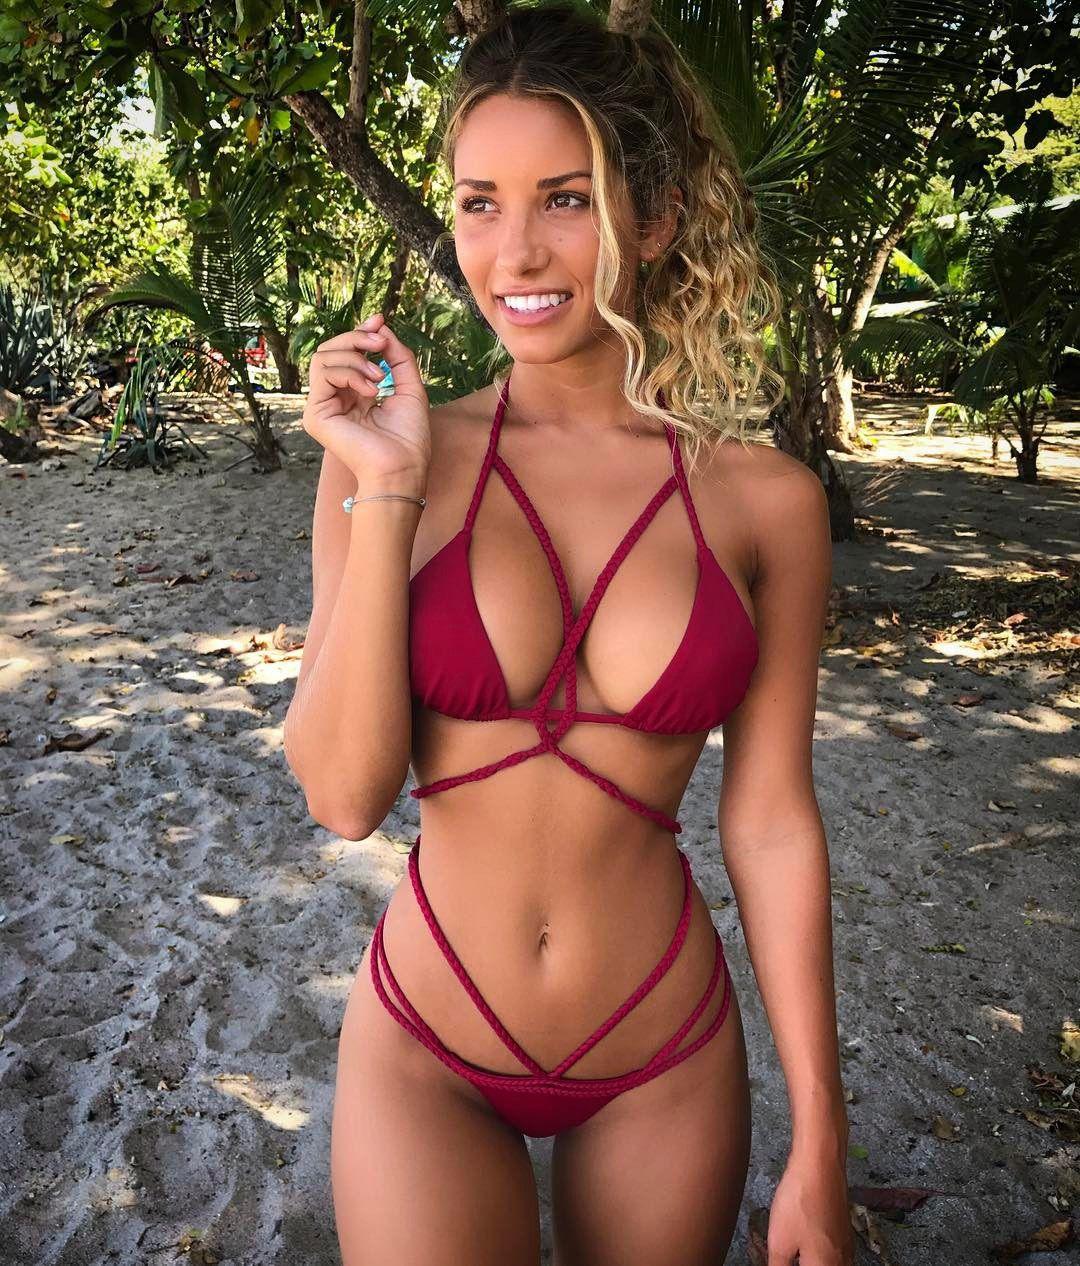 4fe9bd1e44417 Großhandel Neue Sexy Dreieck Push Up Frauen Badeanzug Bikini Set 2018 Sommer  Brasilianischen Strand Weibliche Bademode Wwim Sportbekleidung Badeanzug ...